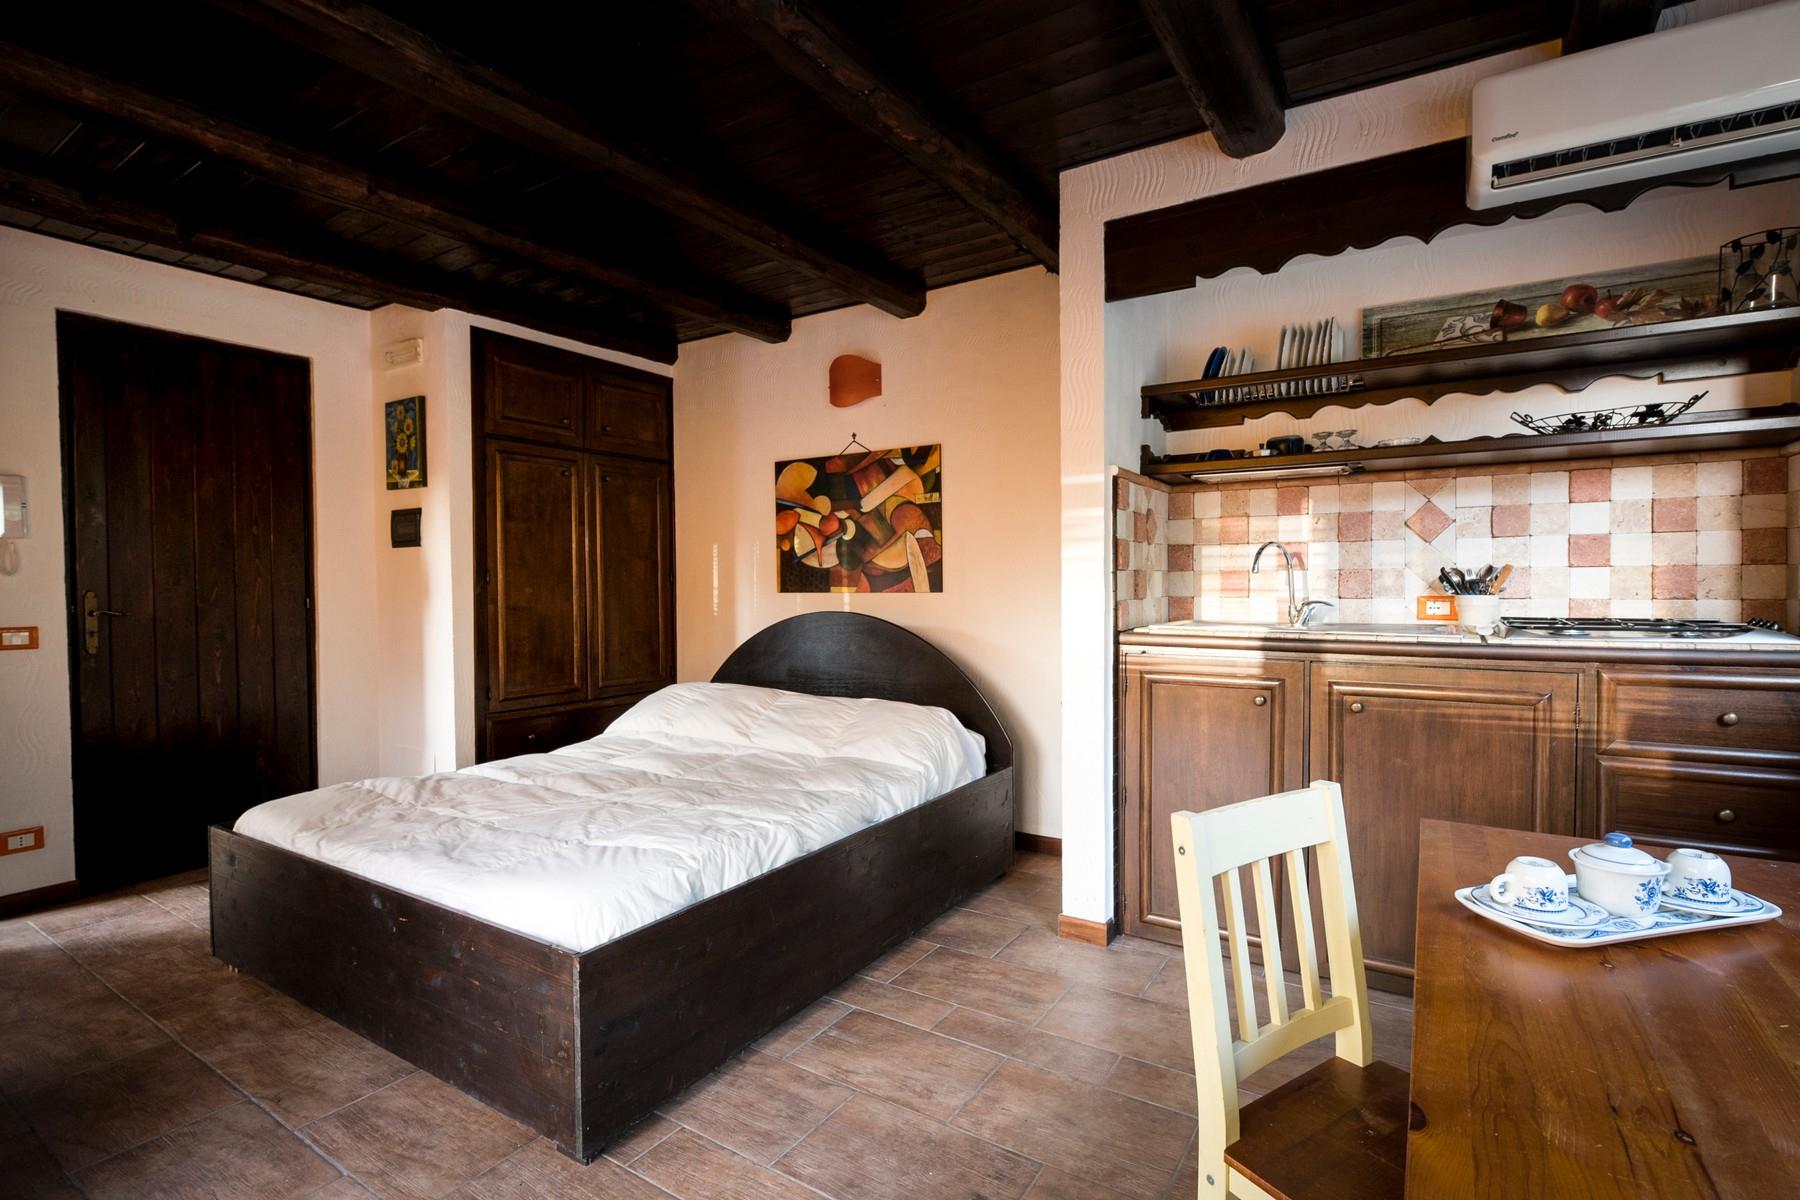 Casa indipendente in Vendita a Noto: 5 locali, 300 mq - Foto 24